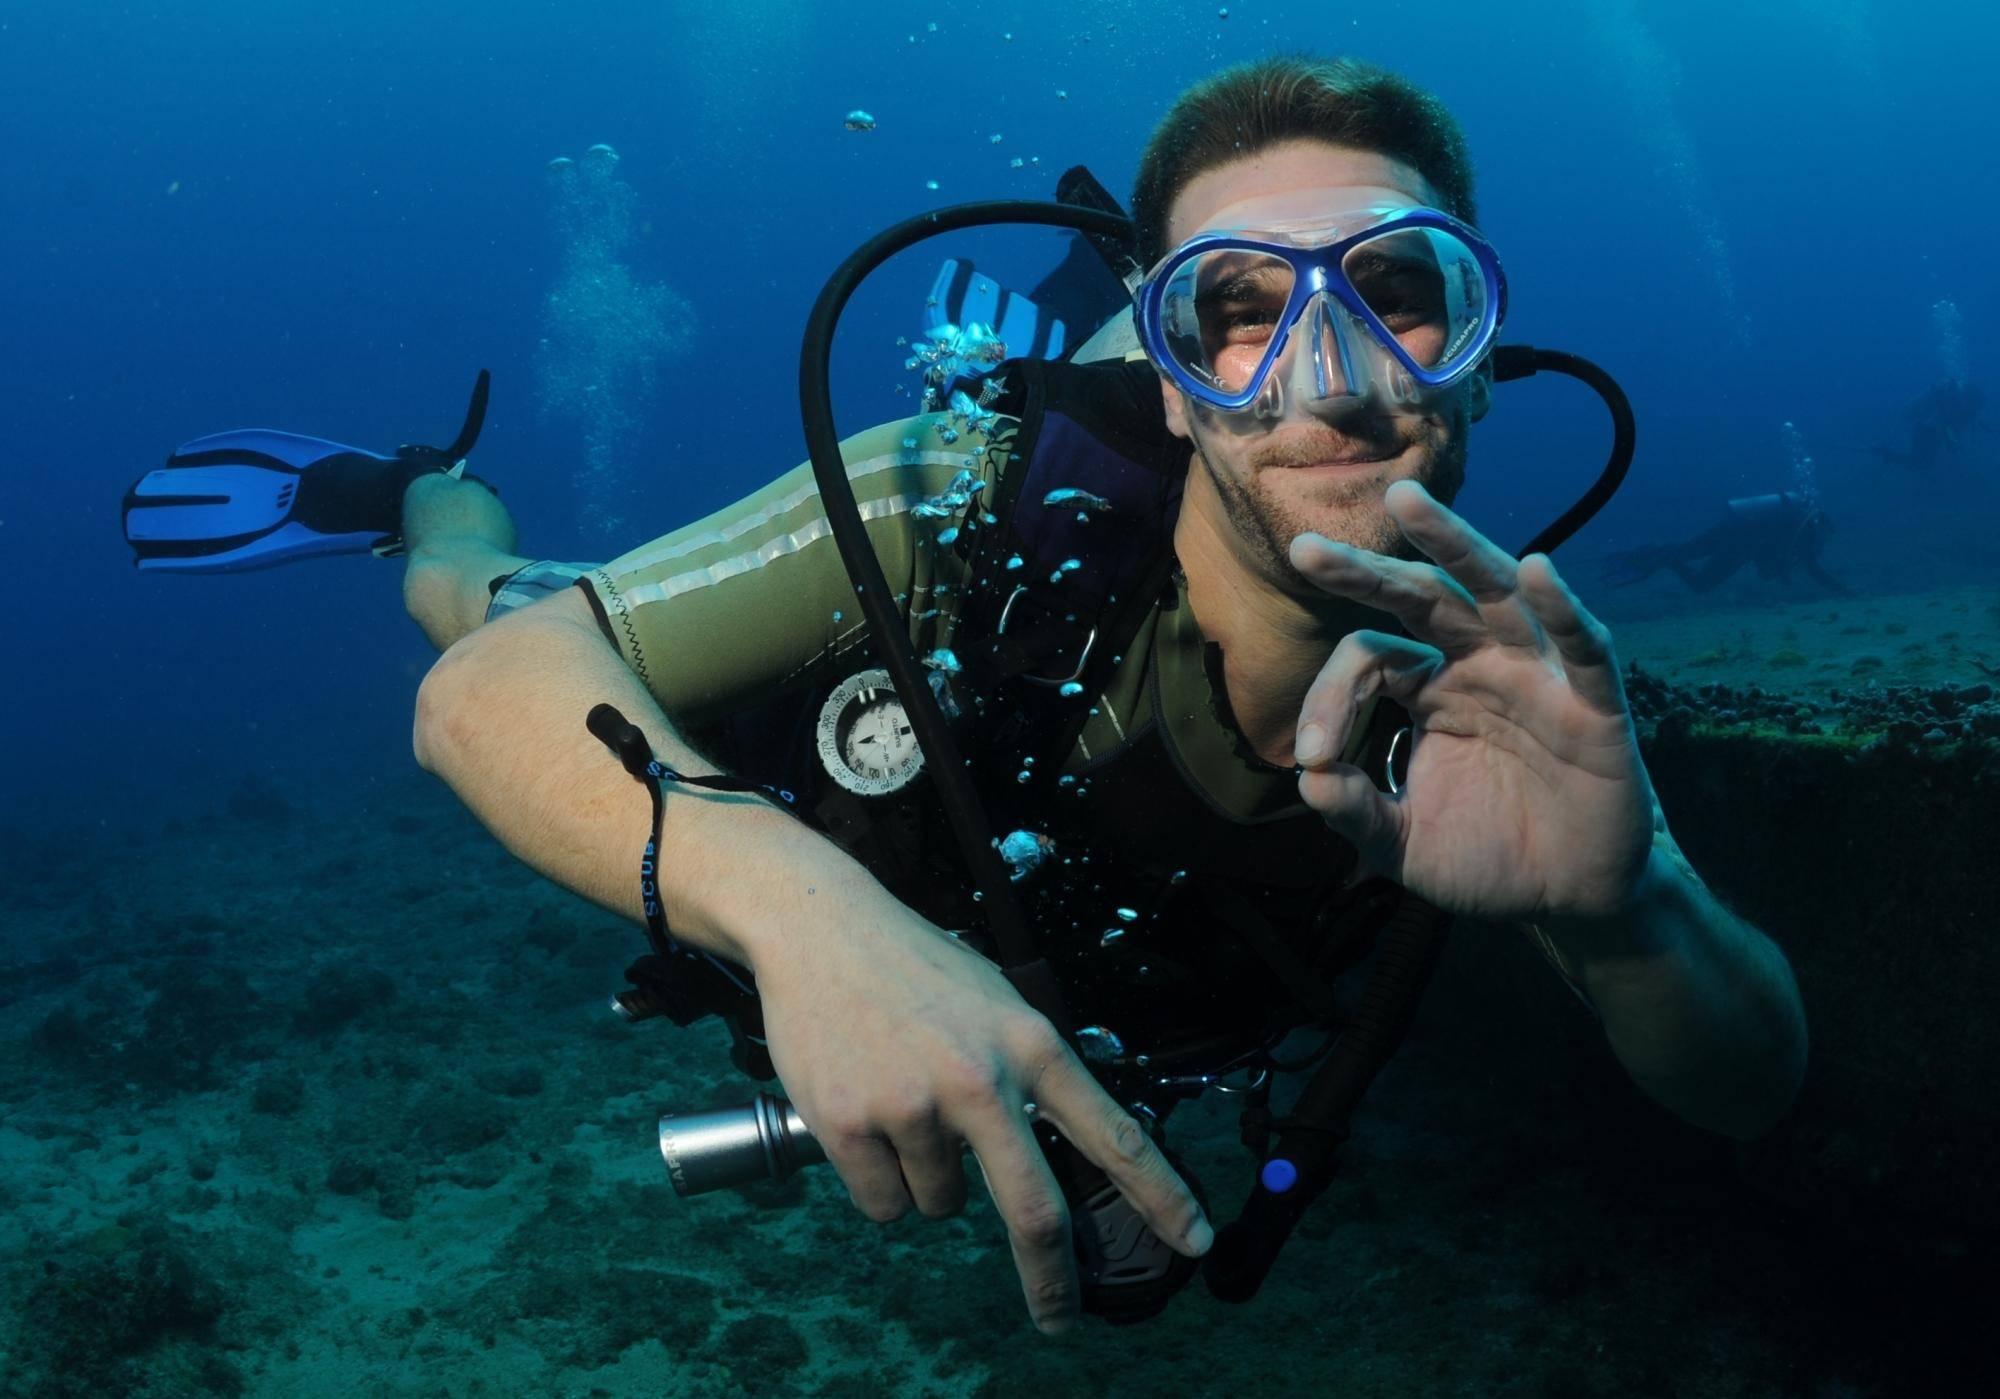 SCUBA: PADI OPEN WATER DIVE COURSE - Aqua Mania Adventures